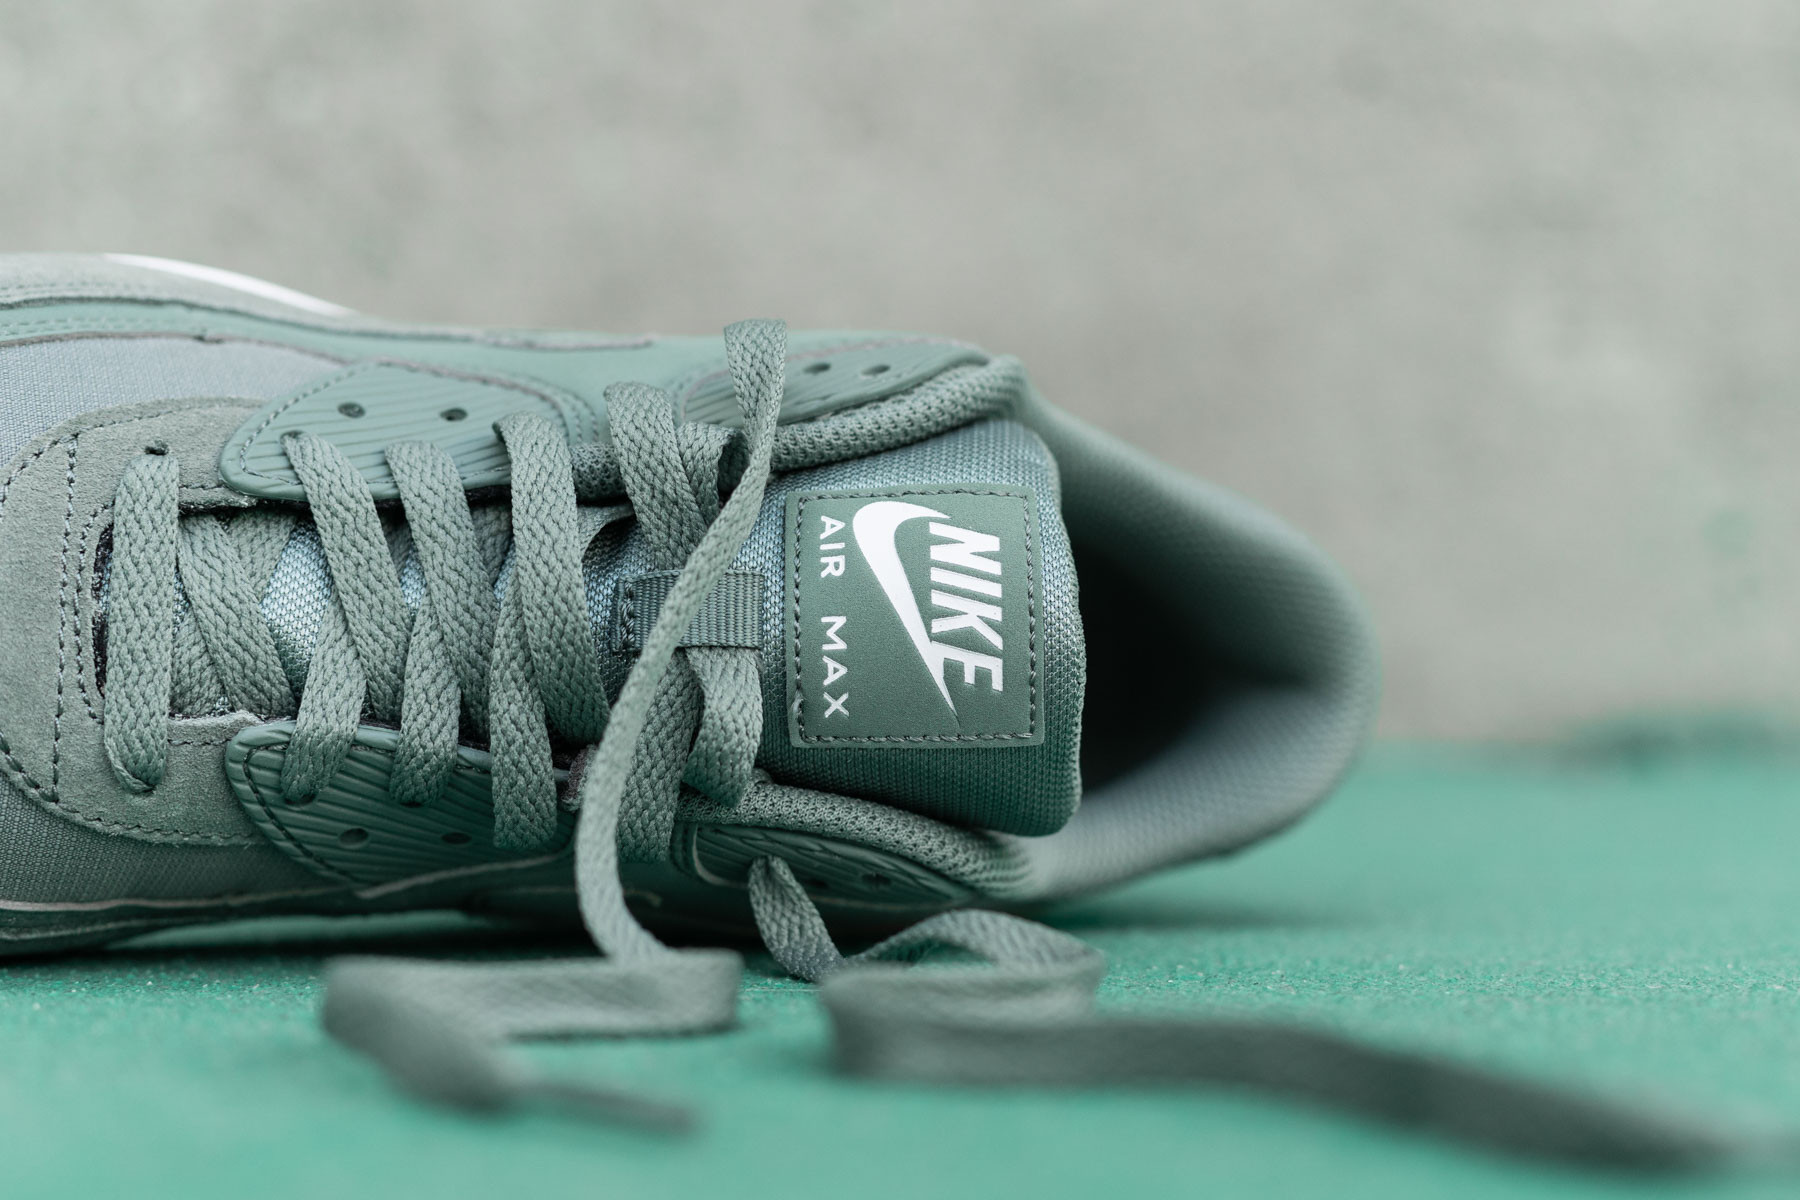 reputable site 9d0a8 5b86b Nike Air Max 90 Essential - Sale - Sneaker.no